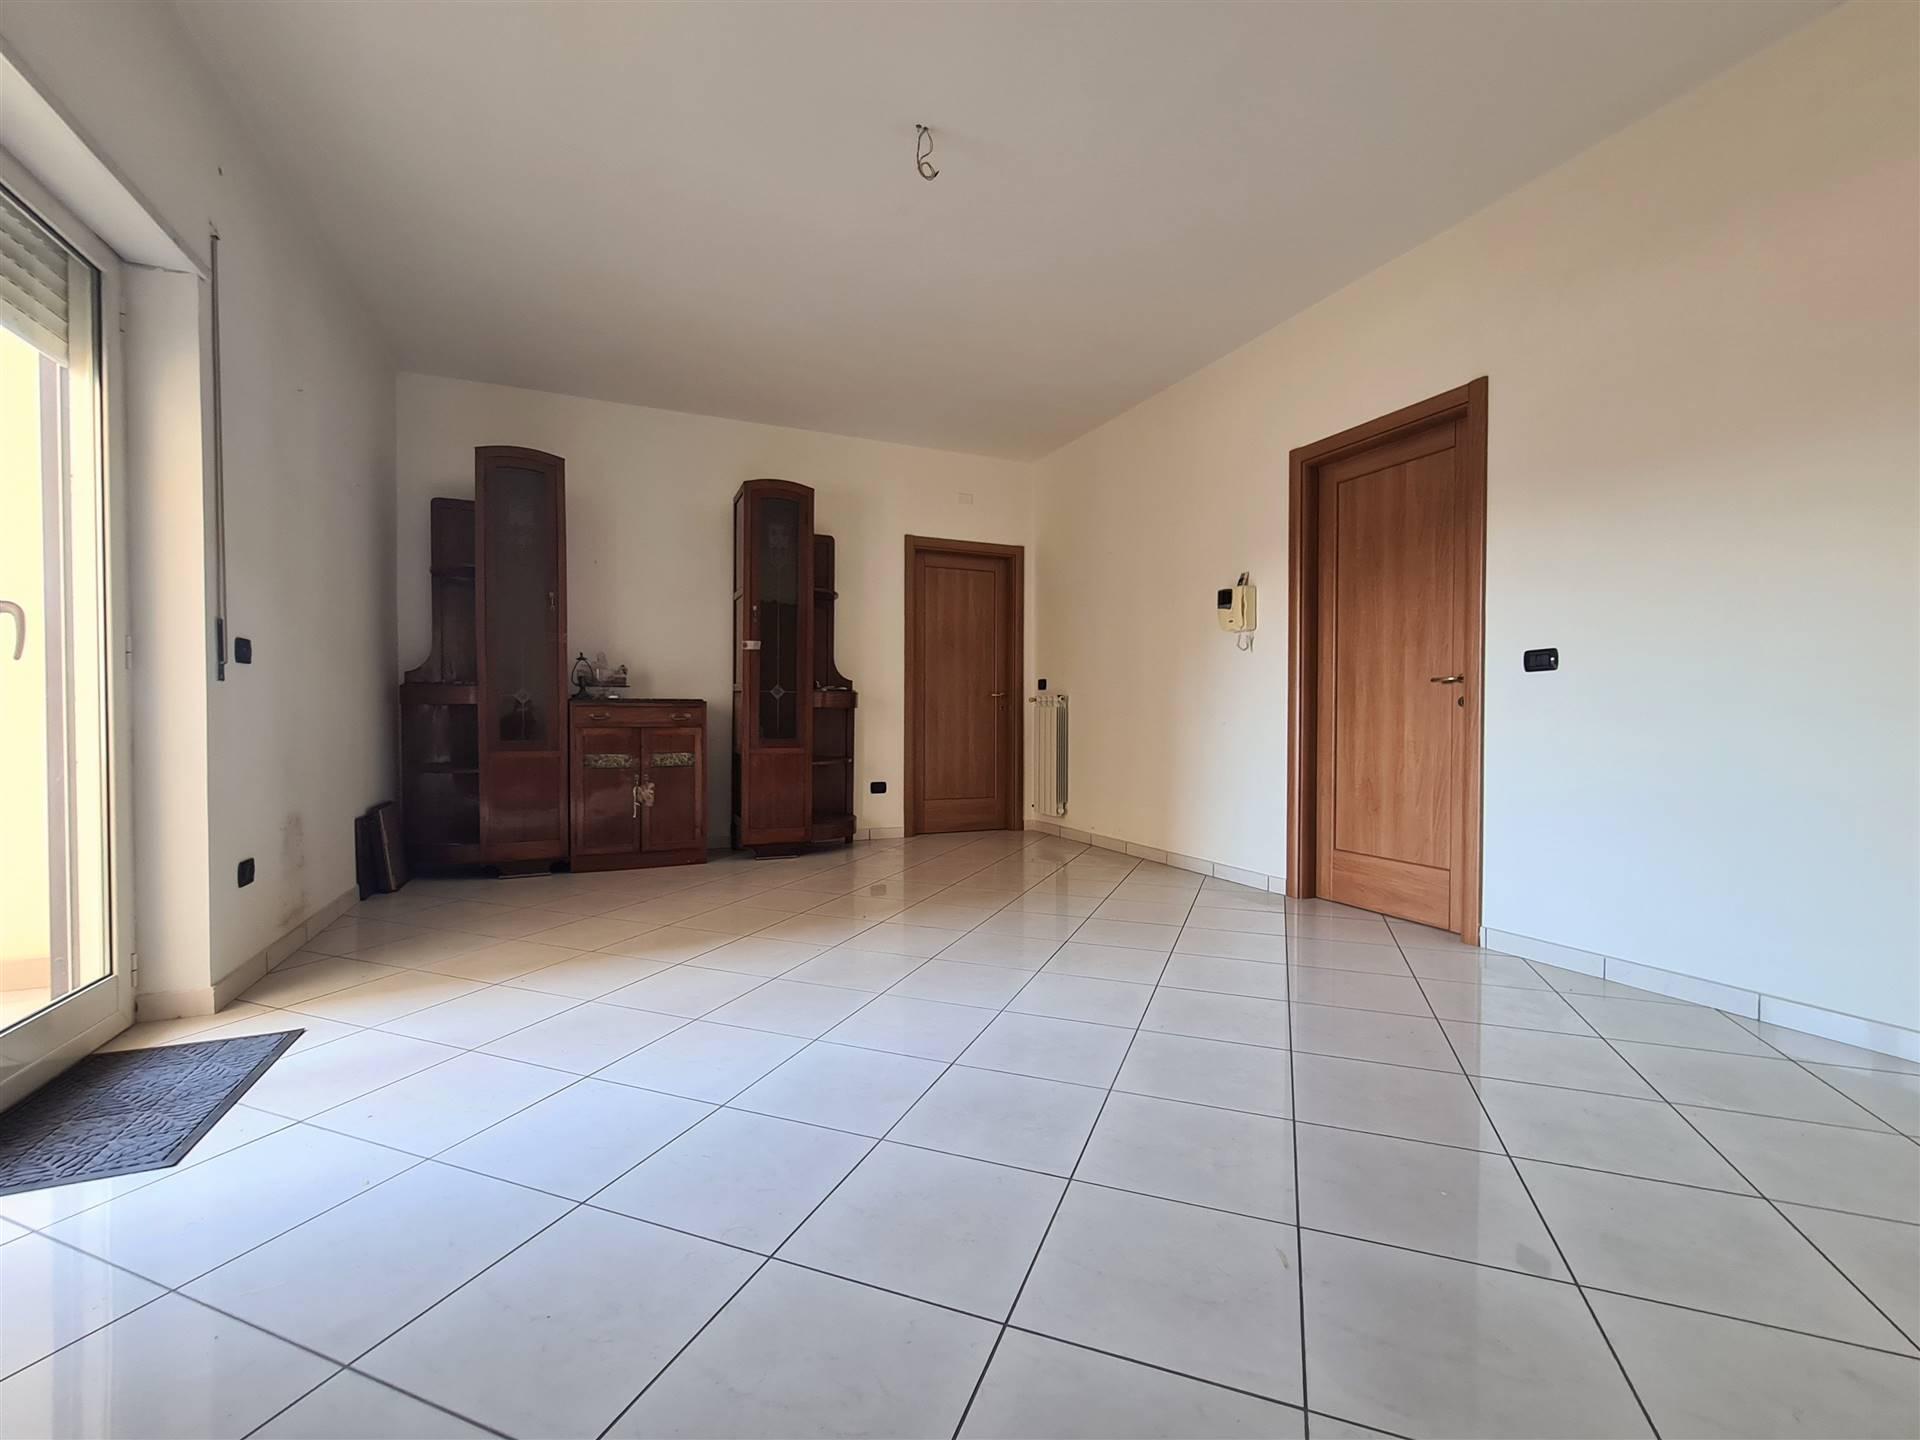 AF901-Appartamento-SANTA-MARIA-CAPUA-VETERE-Via-Achille-Grandi